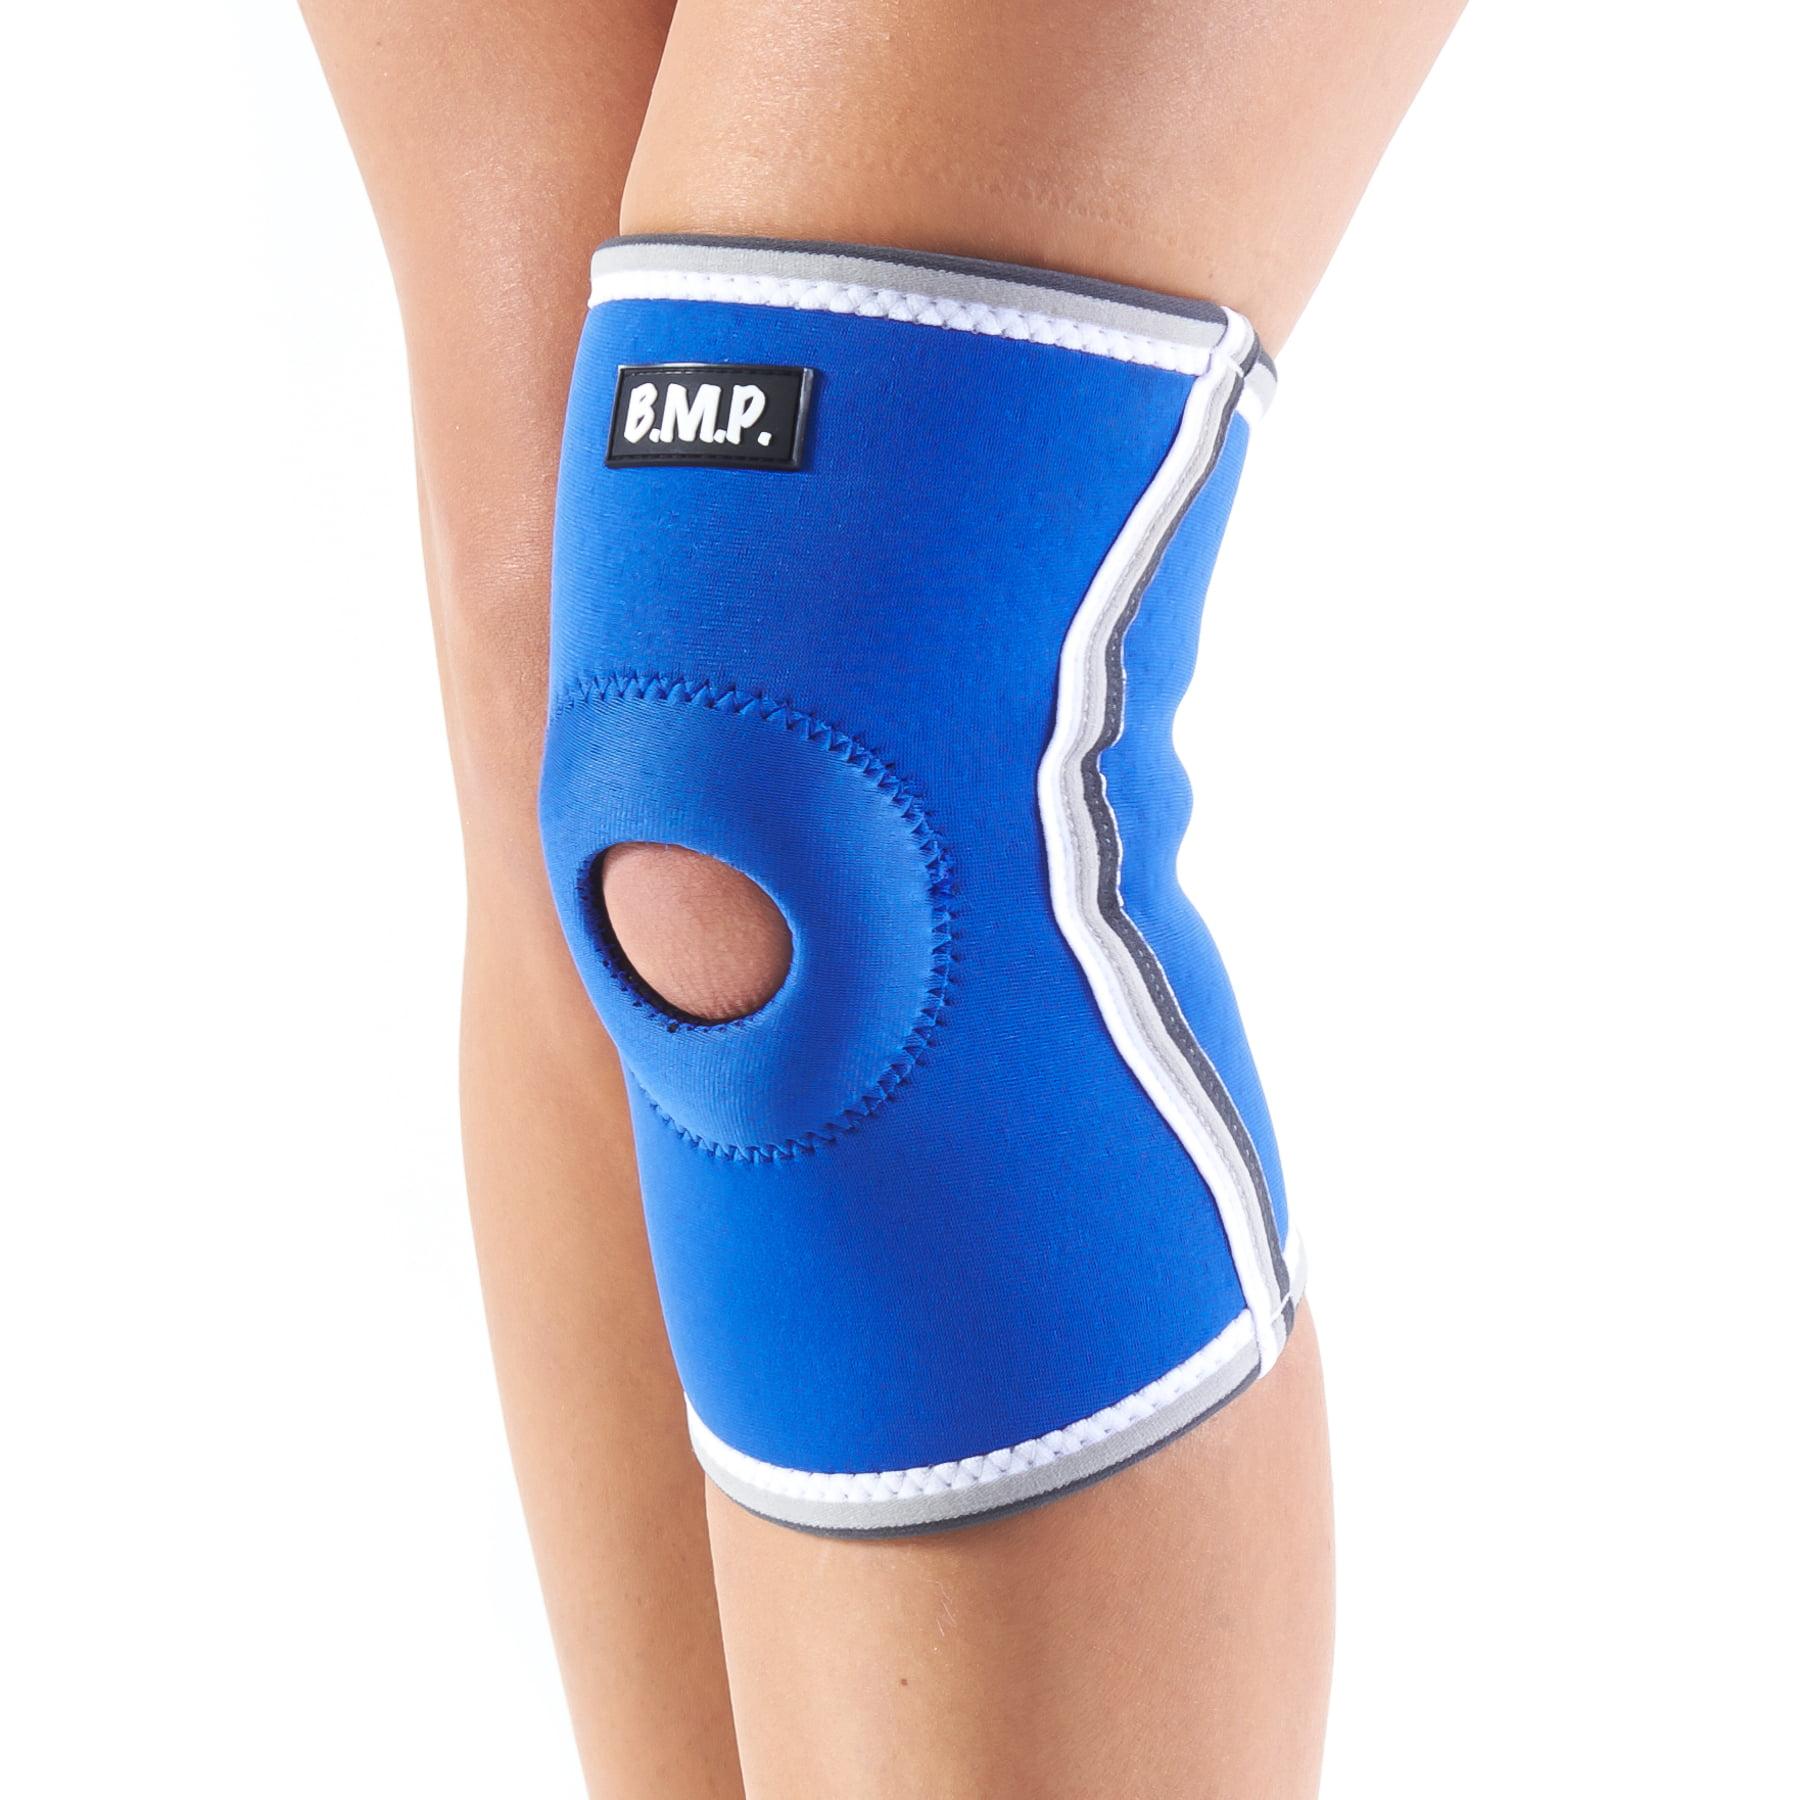 Black Mountain Products Neoprene Knee Brace / Knee Compression Sleeve - Blue, Medium